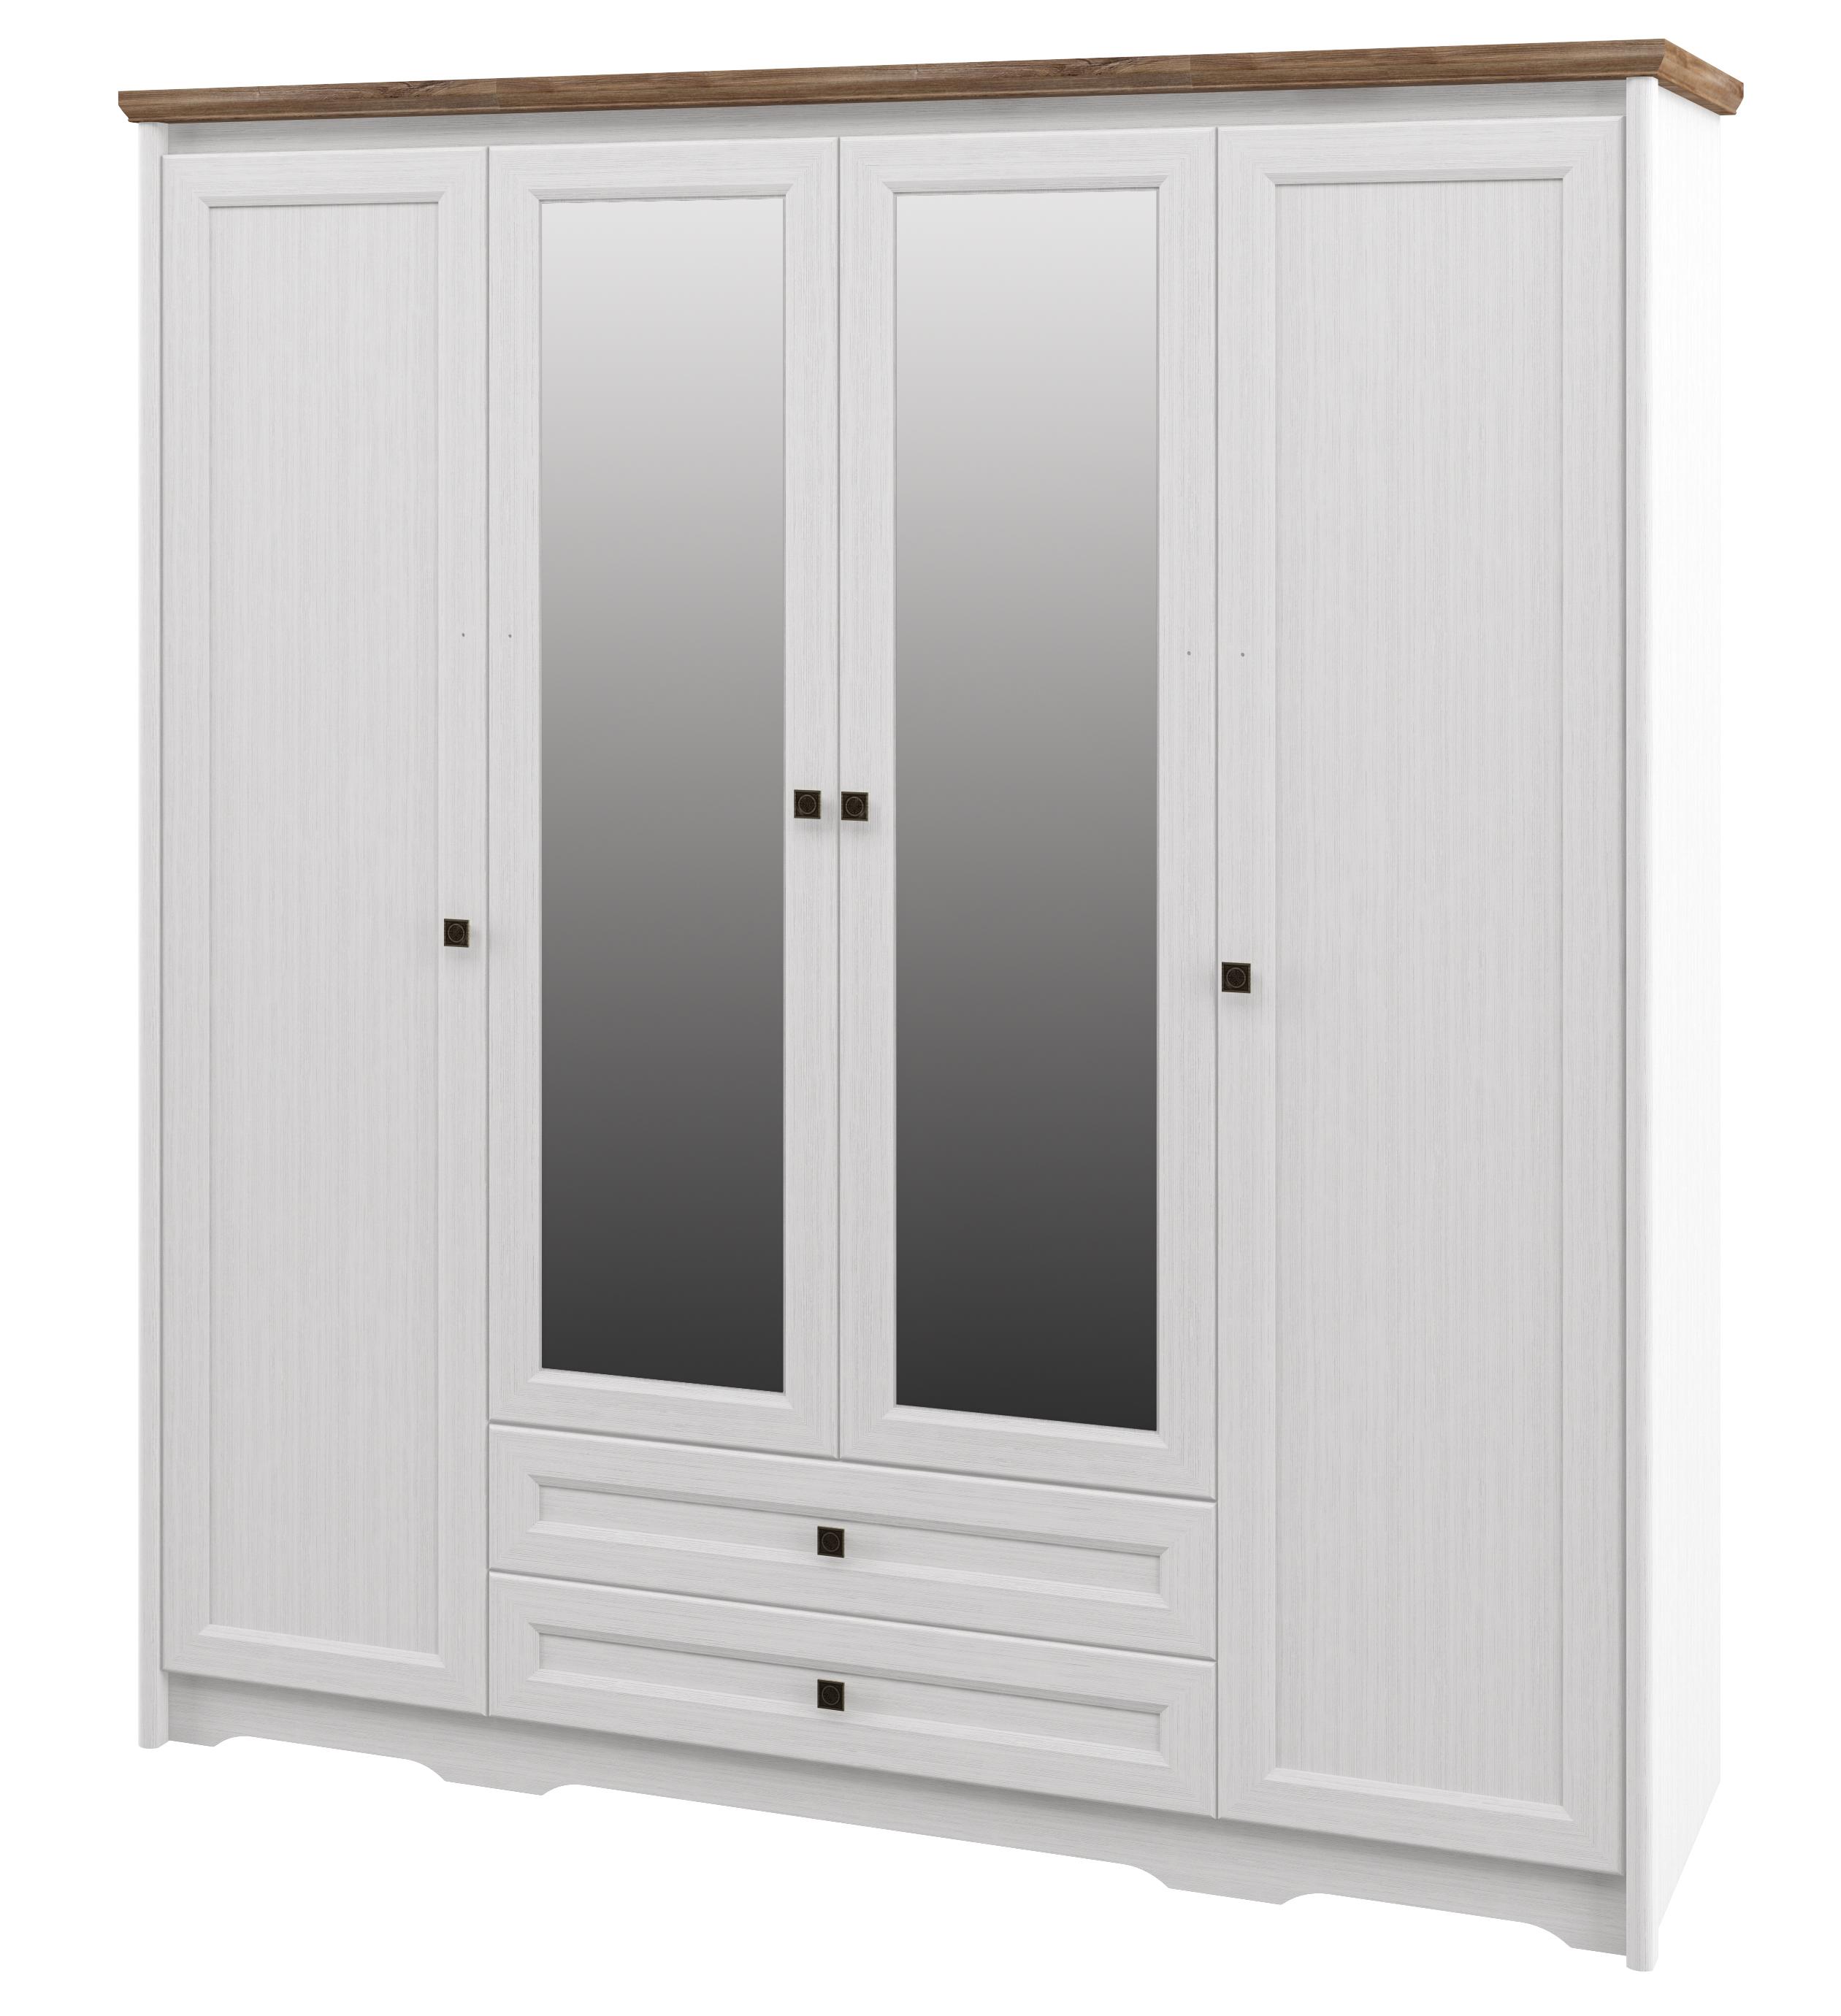 Neman Kleiderschrank 4-türig Tivoli Landhausstil Weiß